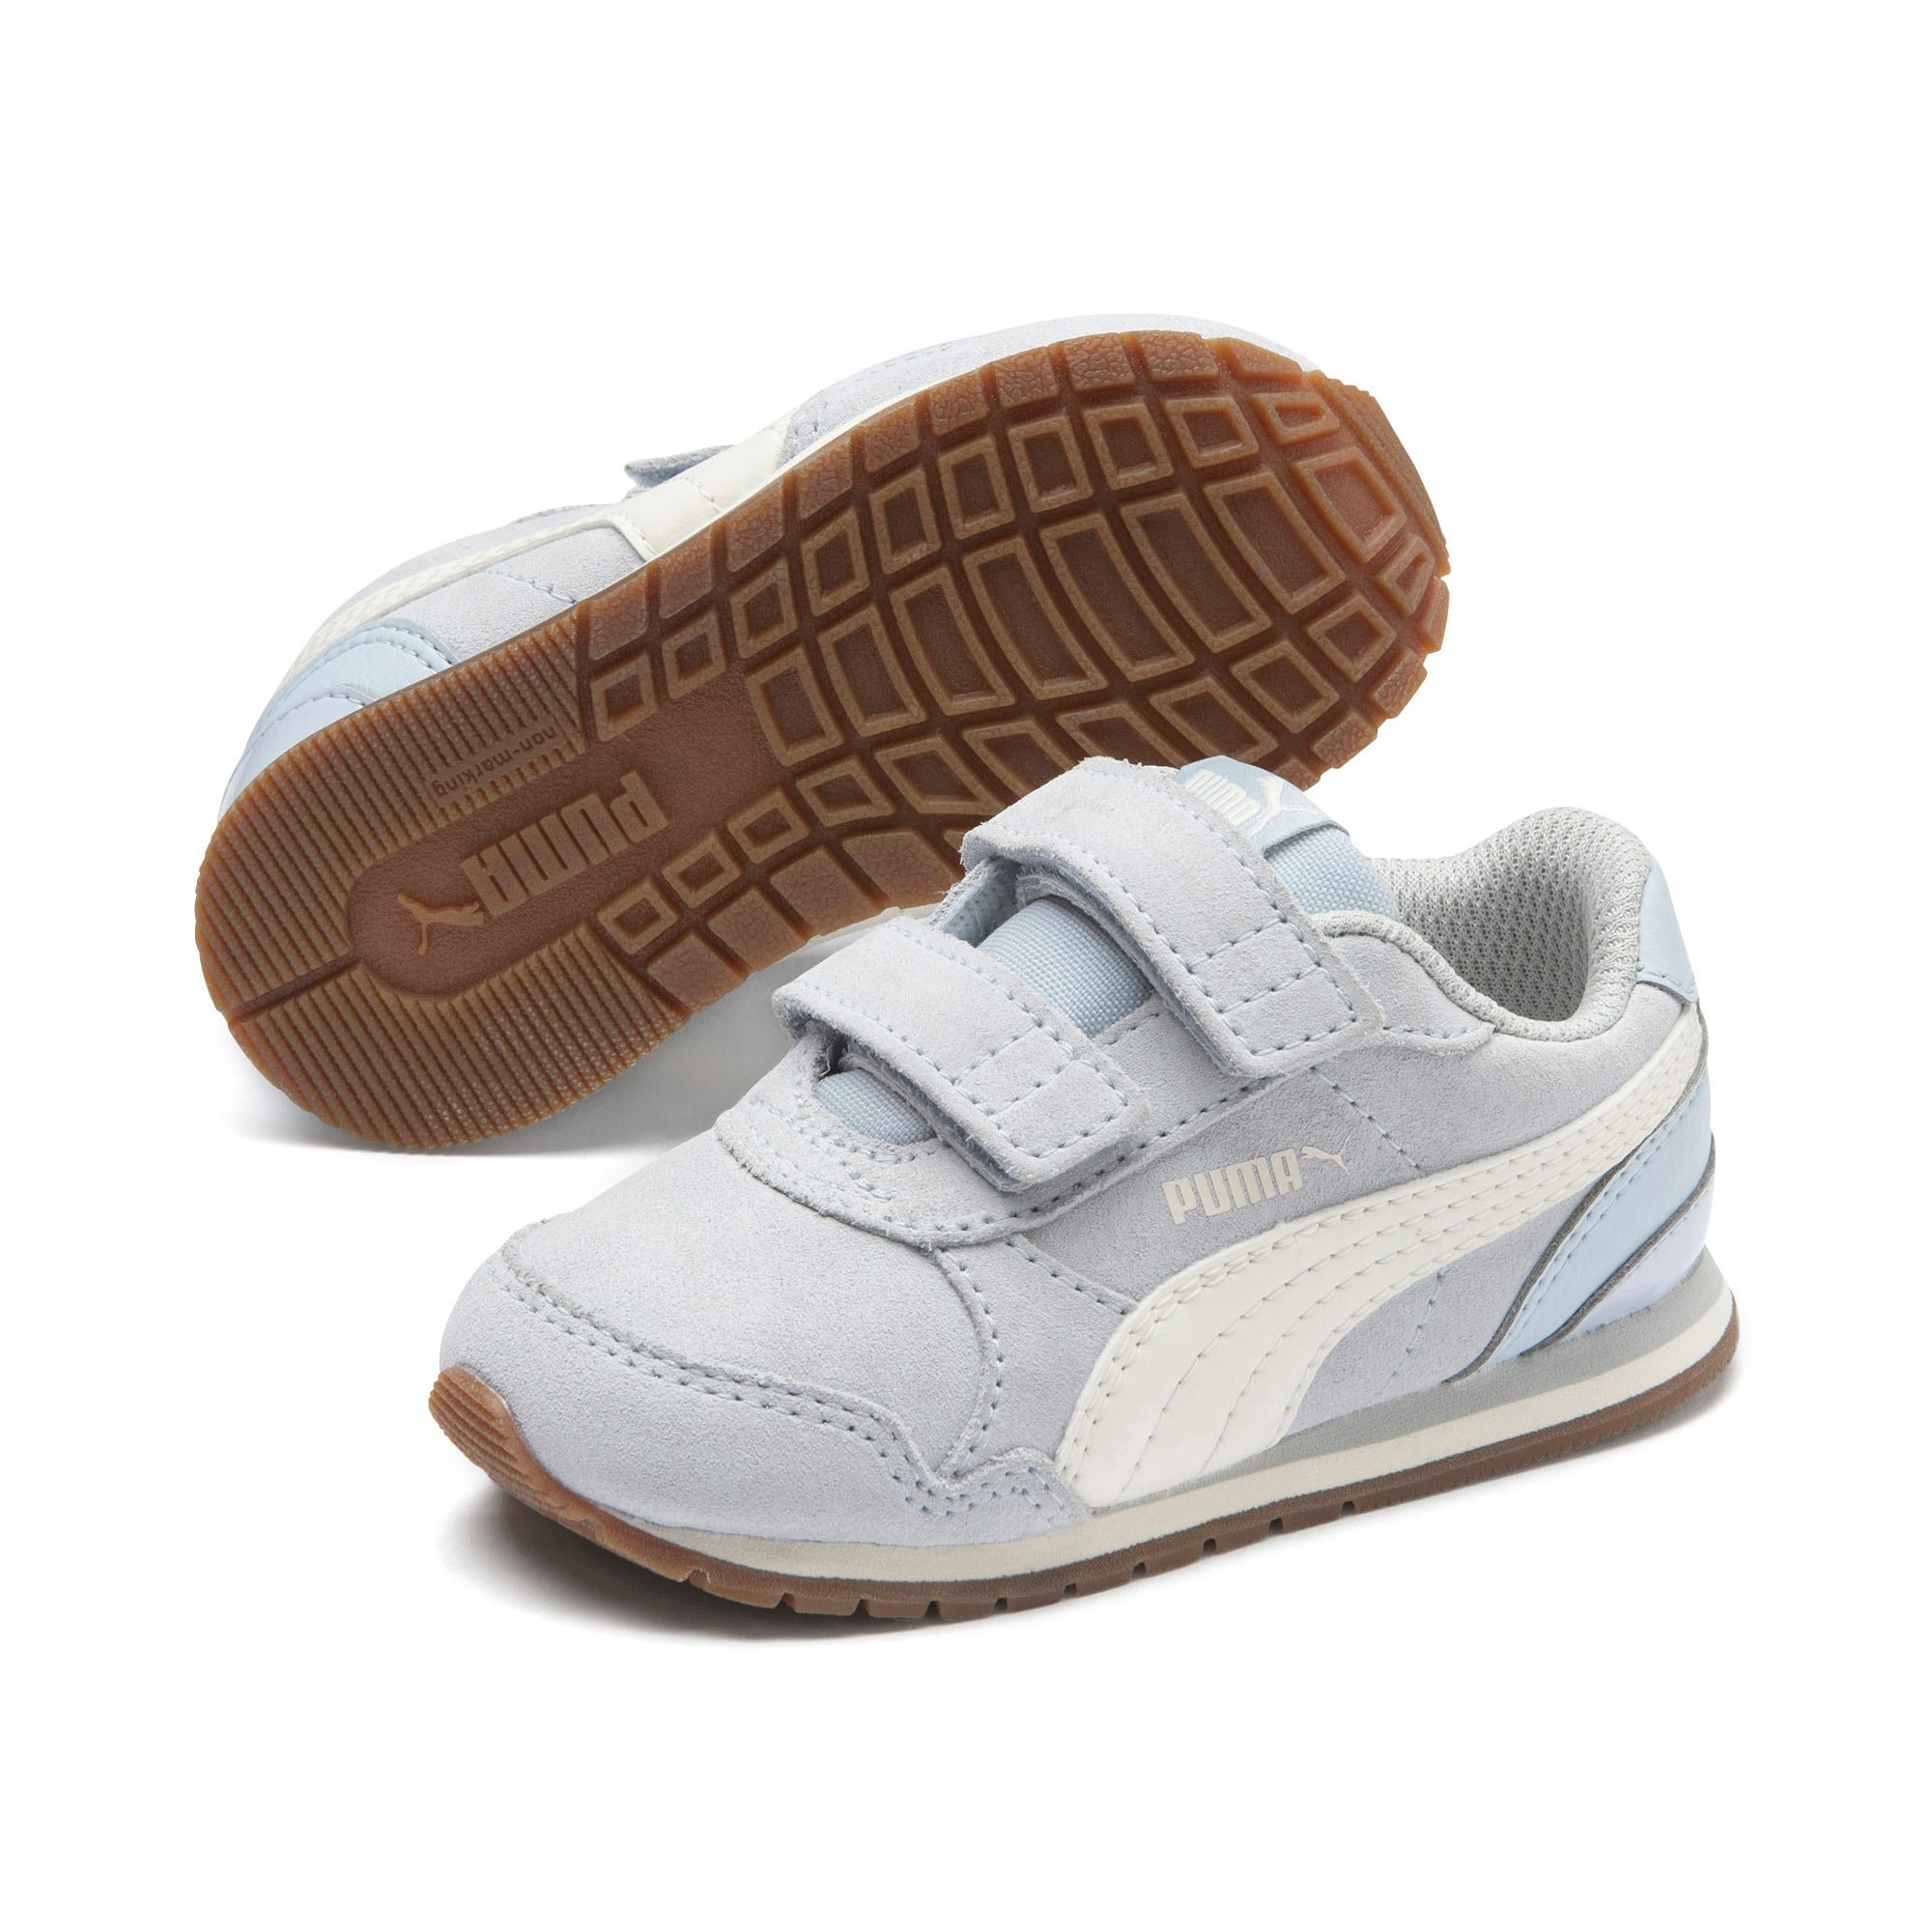 Miniatura 2 de Zapatos ST Runner v2 Suede para bebé, Heather-Whisper White, mediano